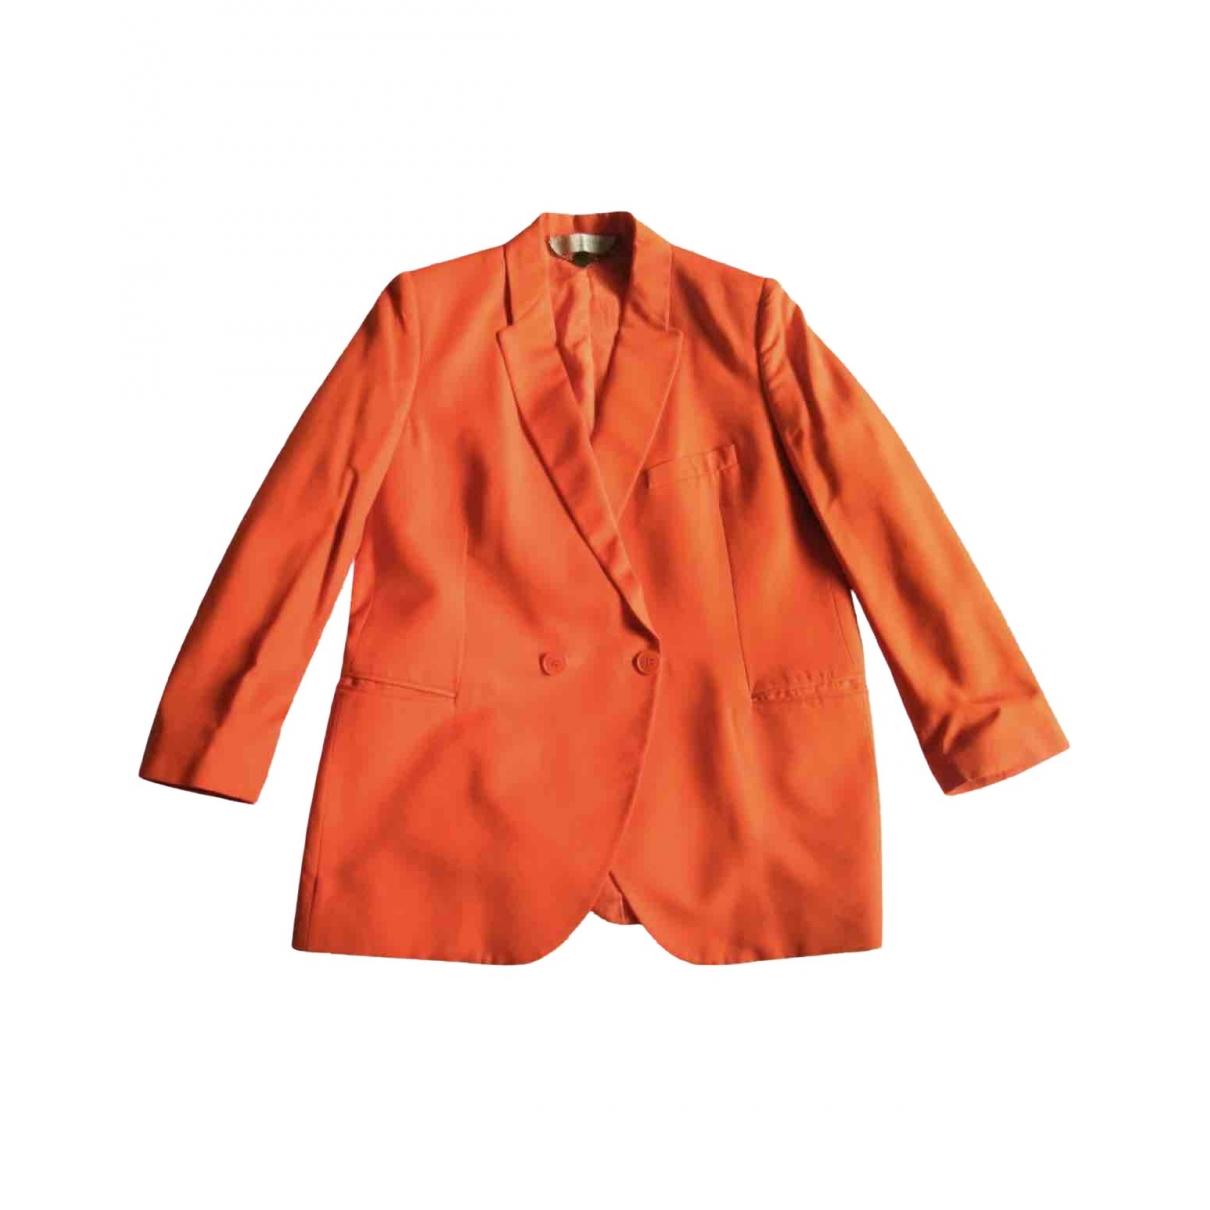 Stella Mccartney \N Jacke in  Orange Baumwolle